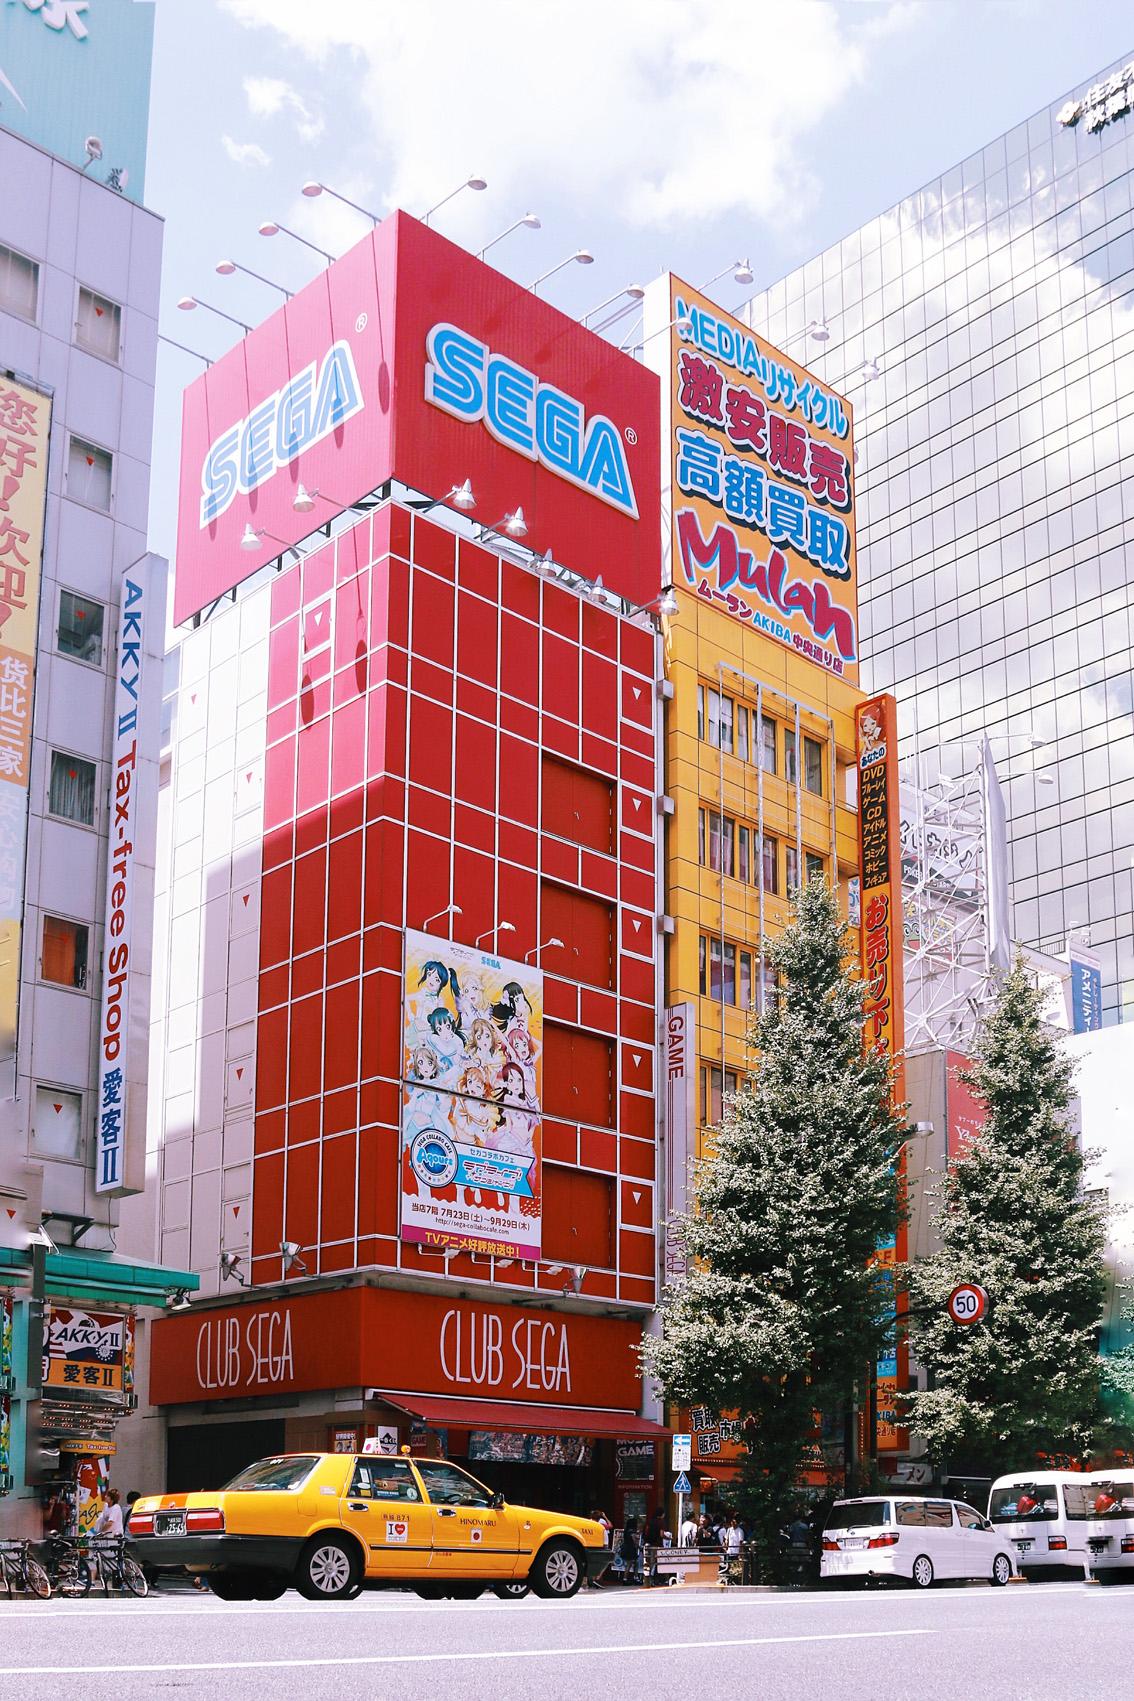 5-1 Giappotour: last day in Tokyo. Ueno, Ginza, Akihabara and Roppongi Hills.